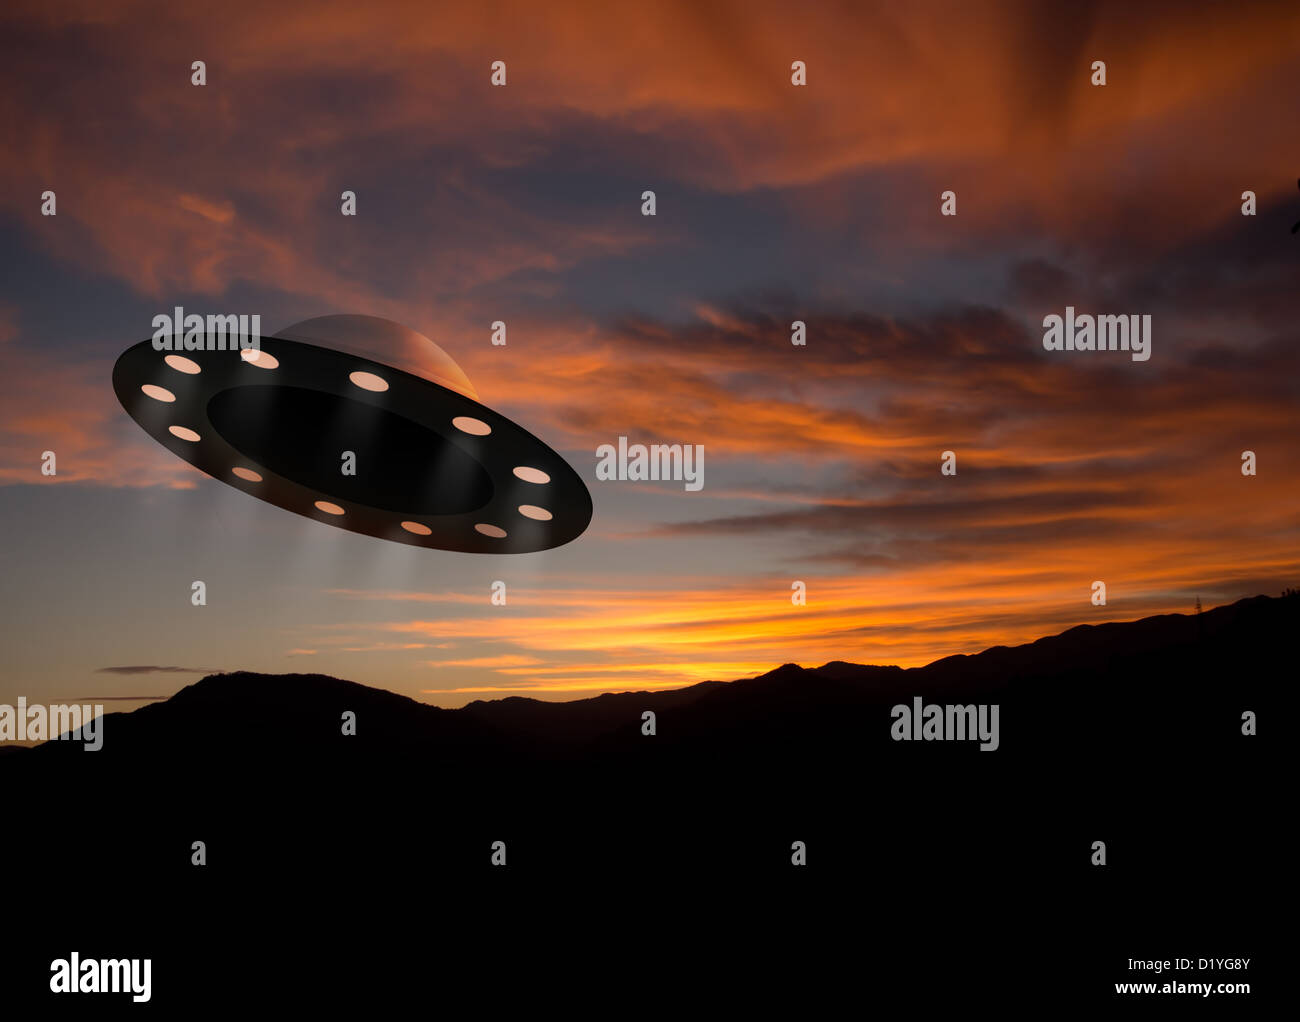 UFO at sunset - Stock Image